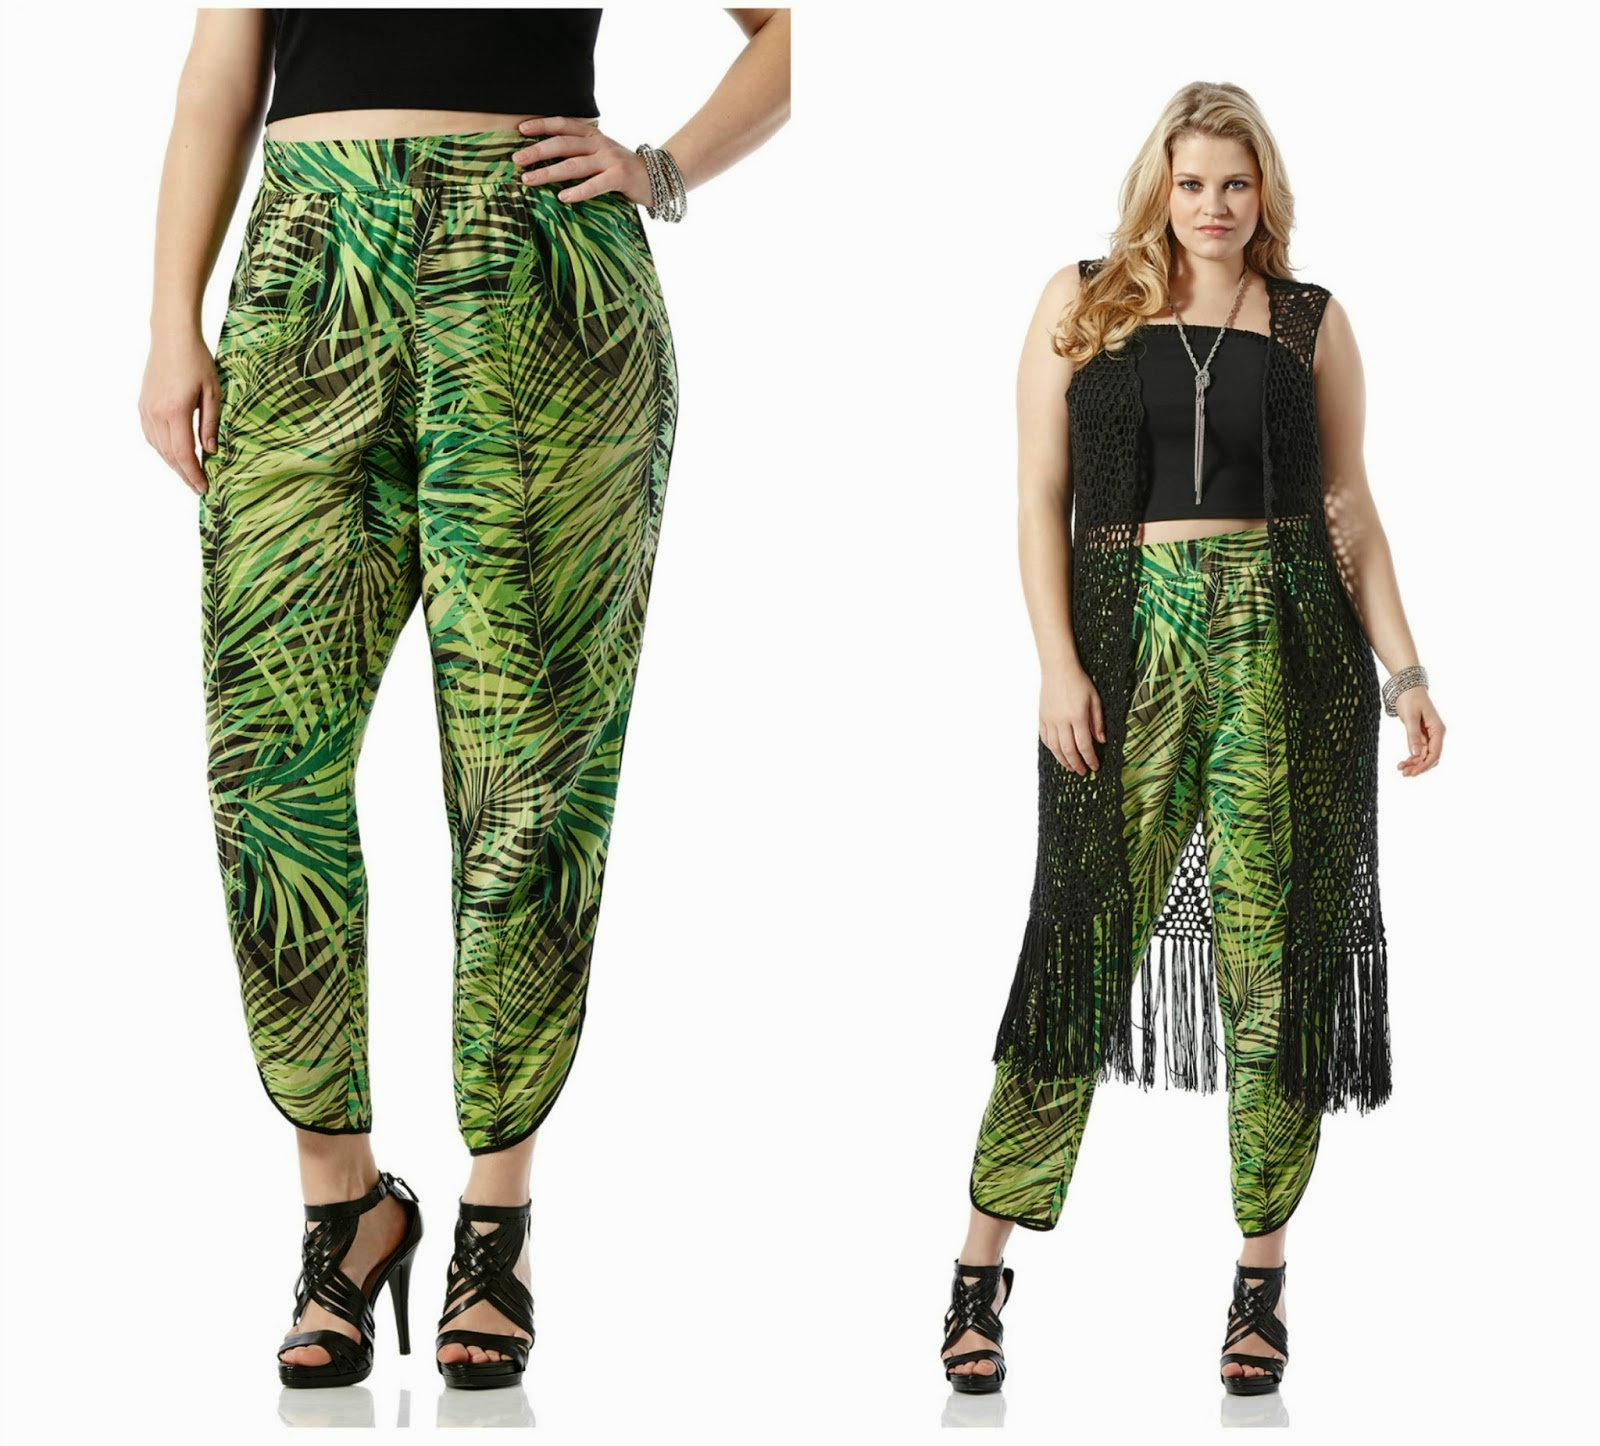 tropical prints, pants, crochet, duster, plus size fashion, cidstylefile, dillards